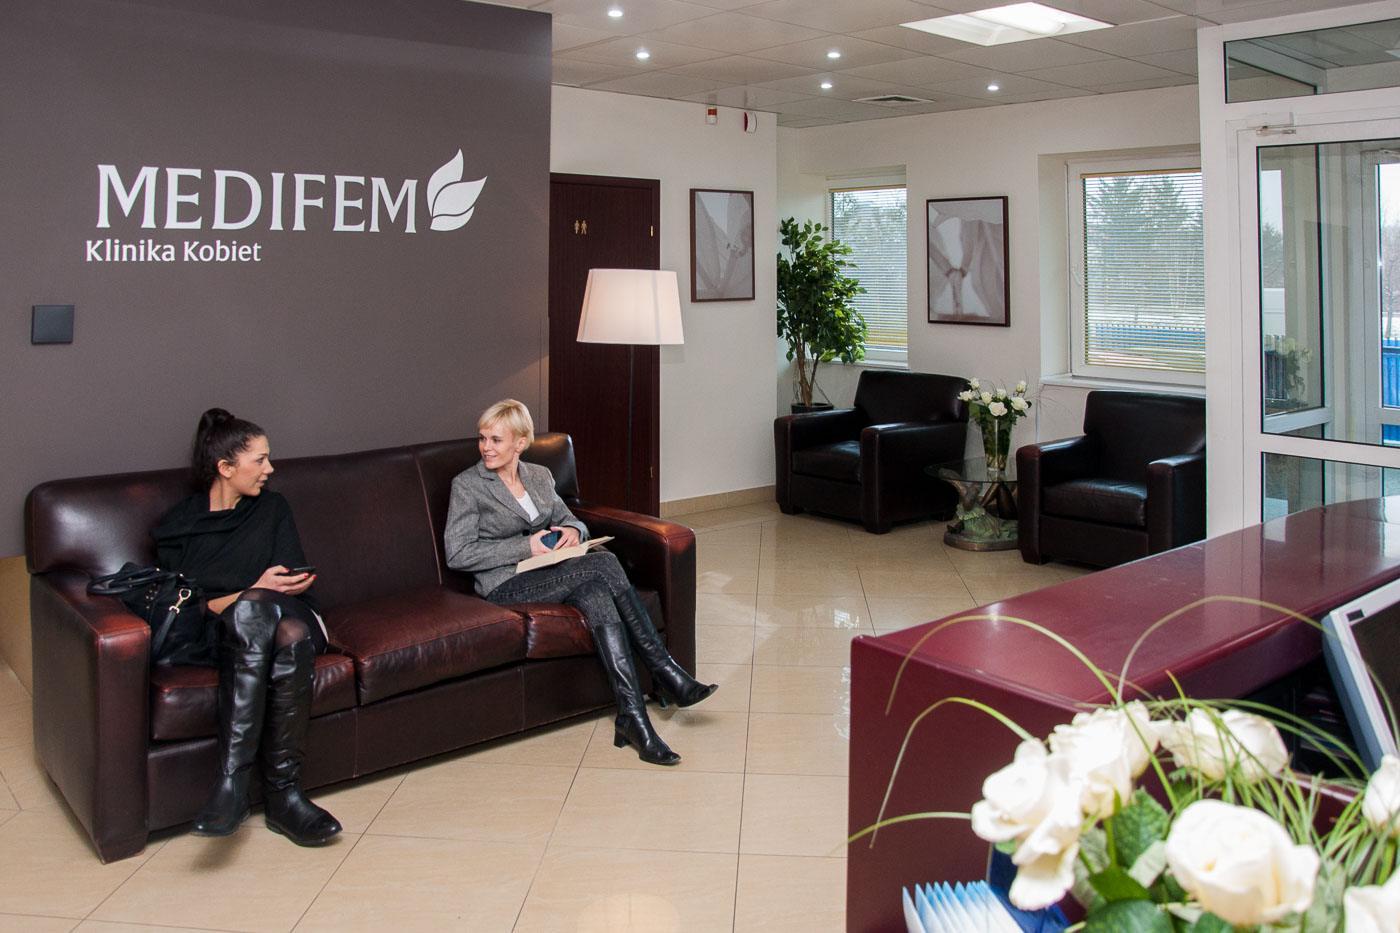 Medifem gallery - picture 6